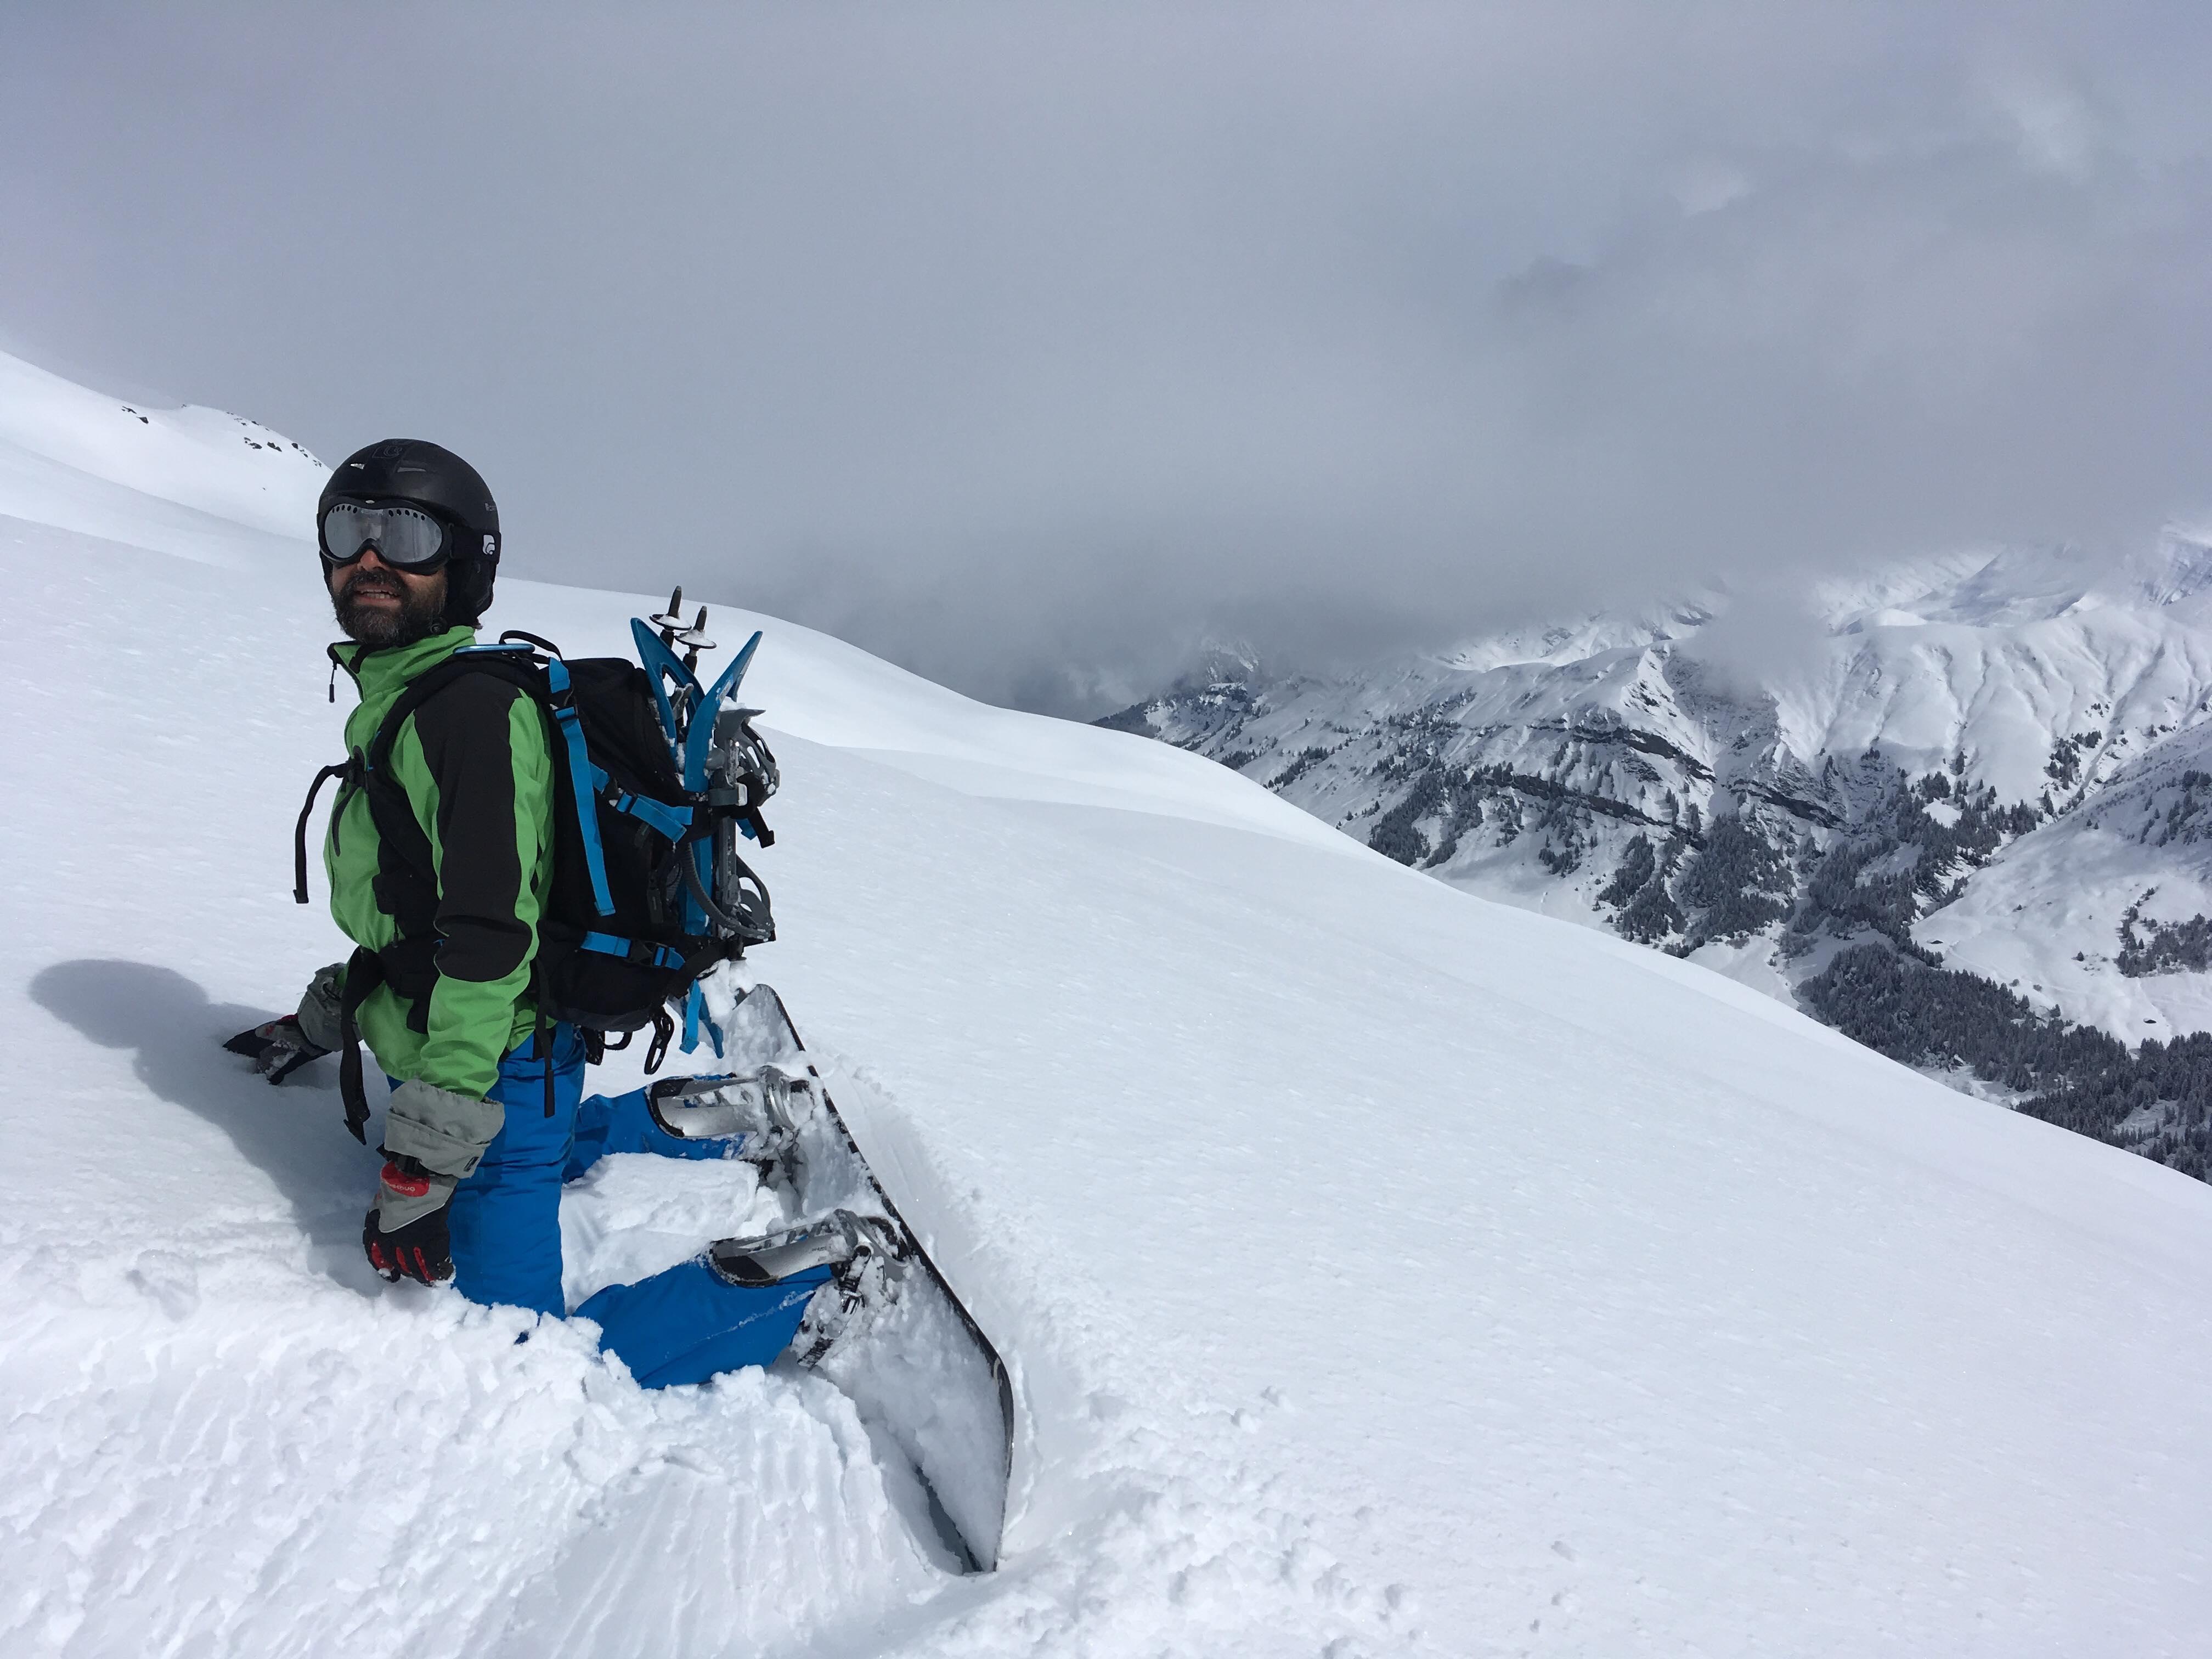 Col de la Louze snowboard 10